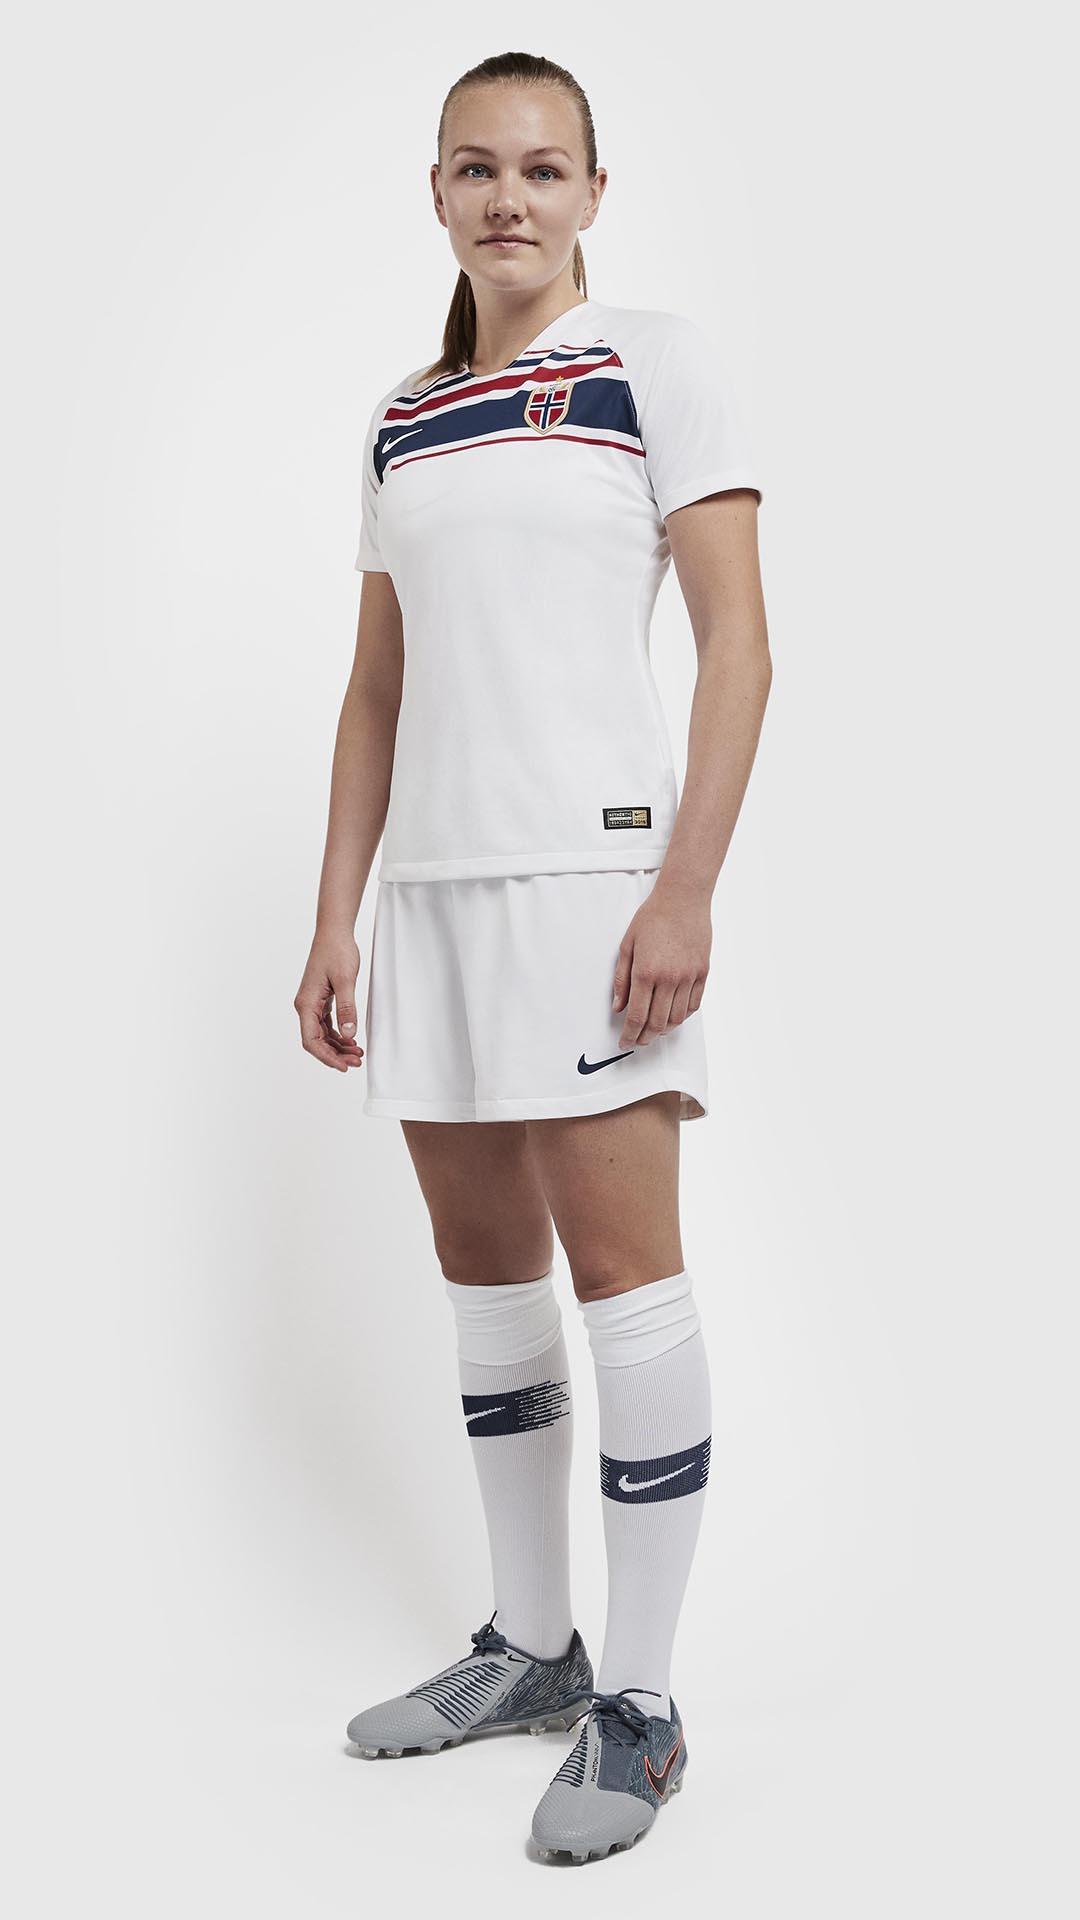 9280bab3f Norway 2019 Women s World Cup Nike Kits - FOOTBALL FASHION.ORG